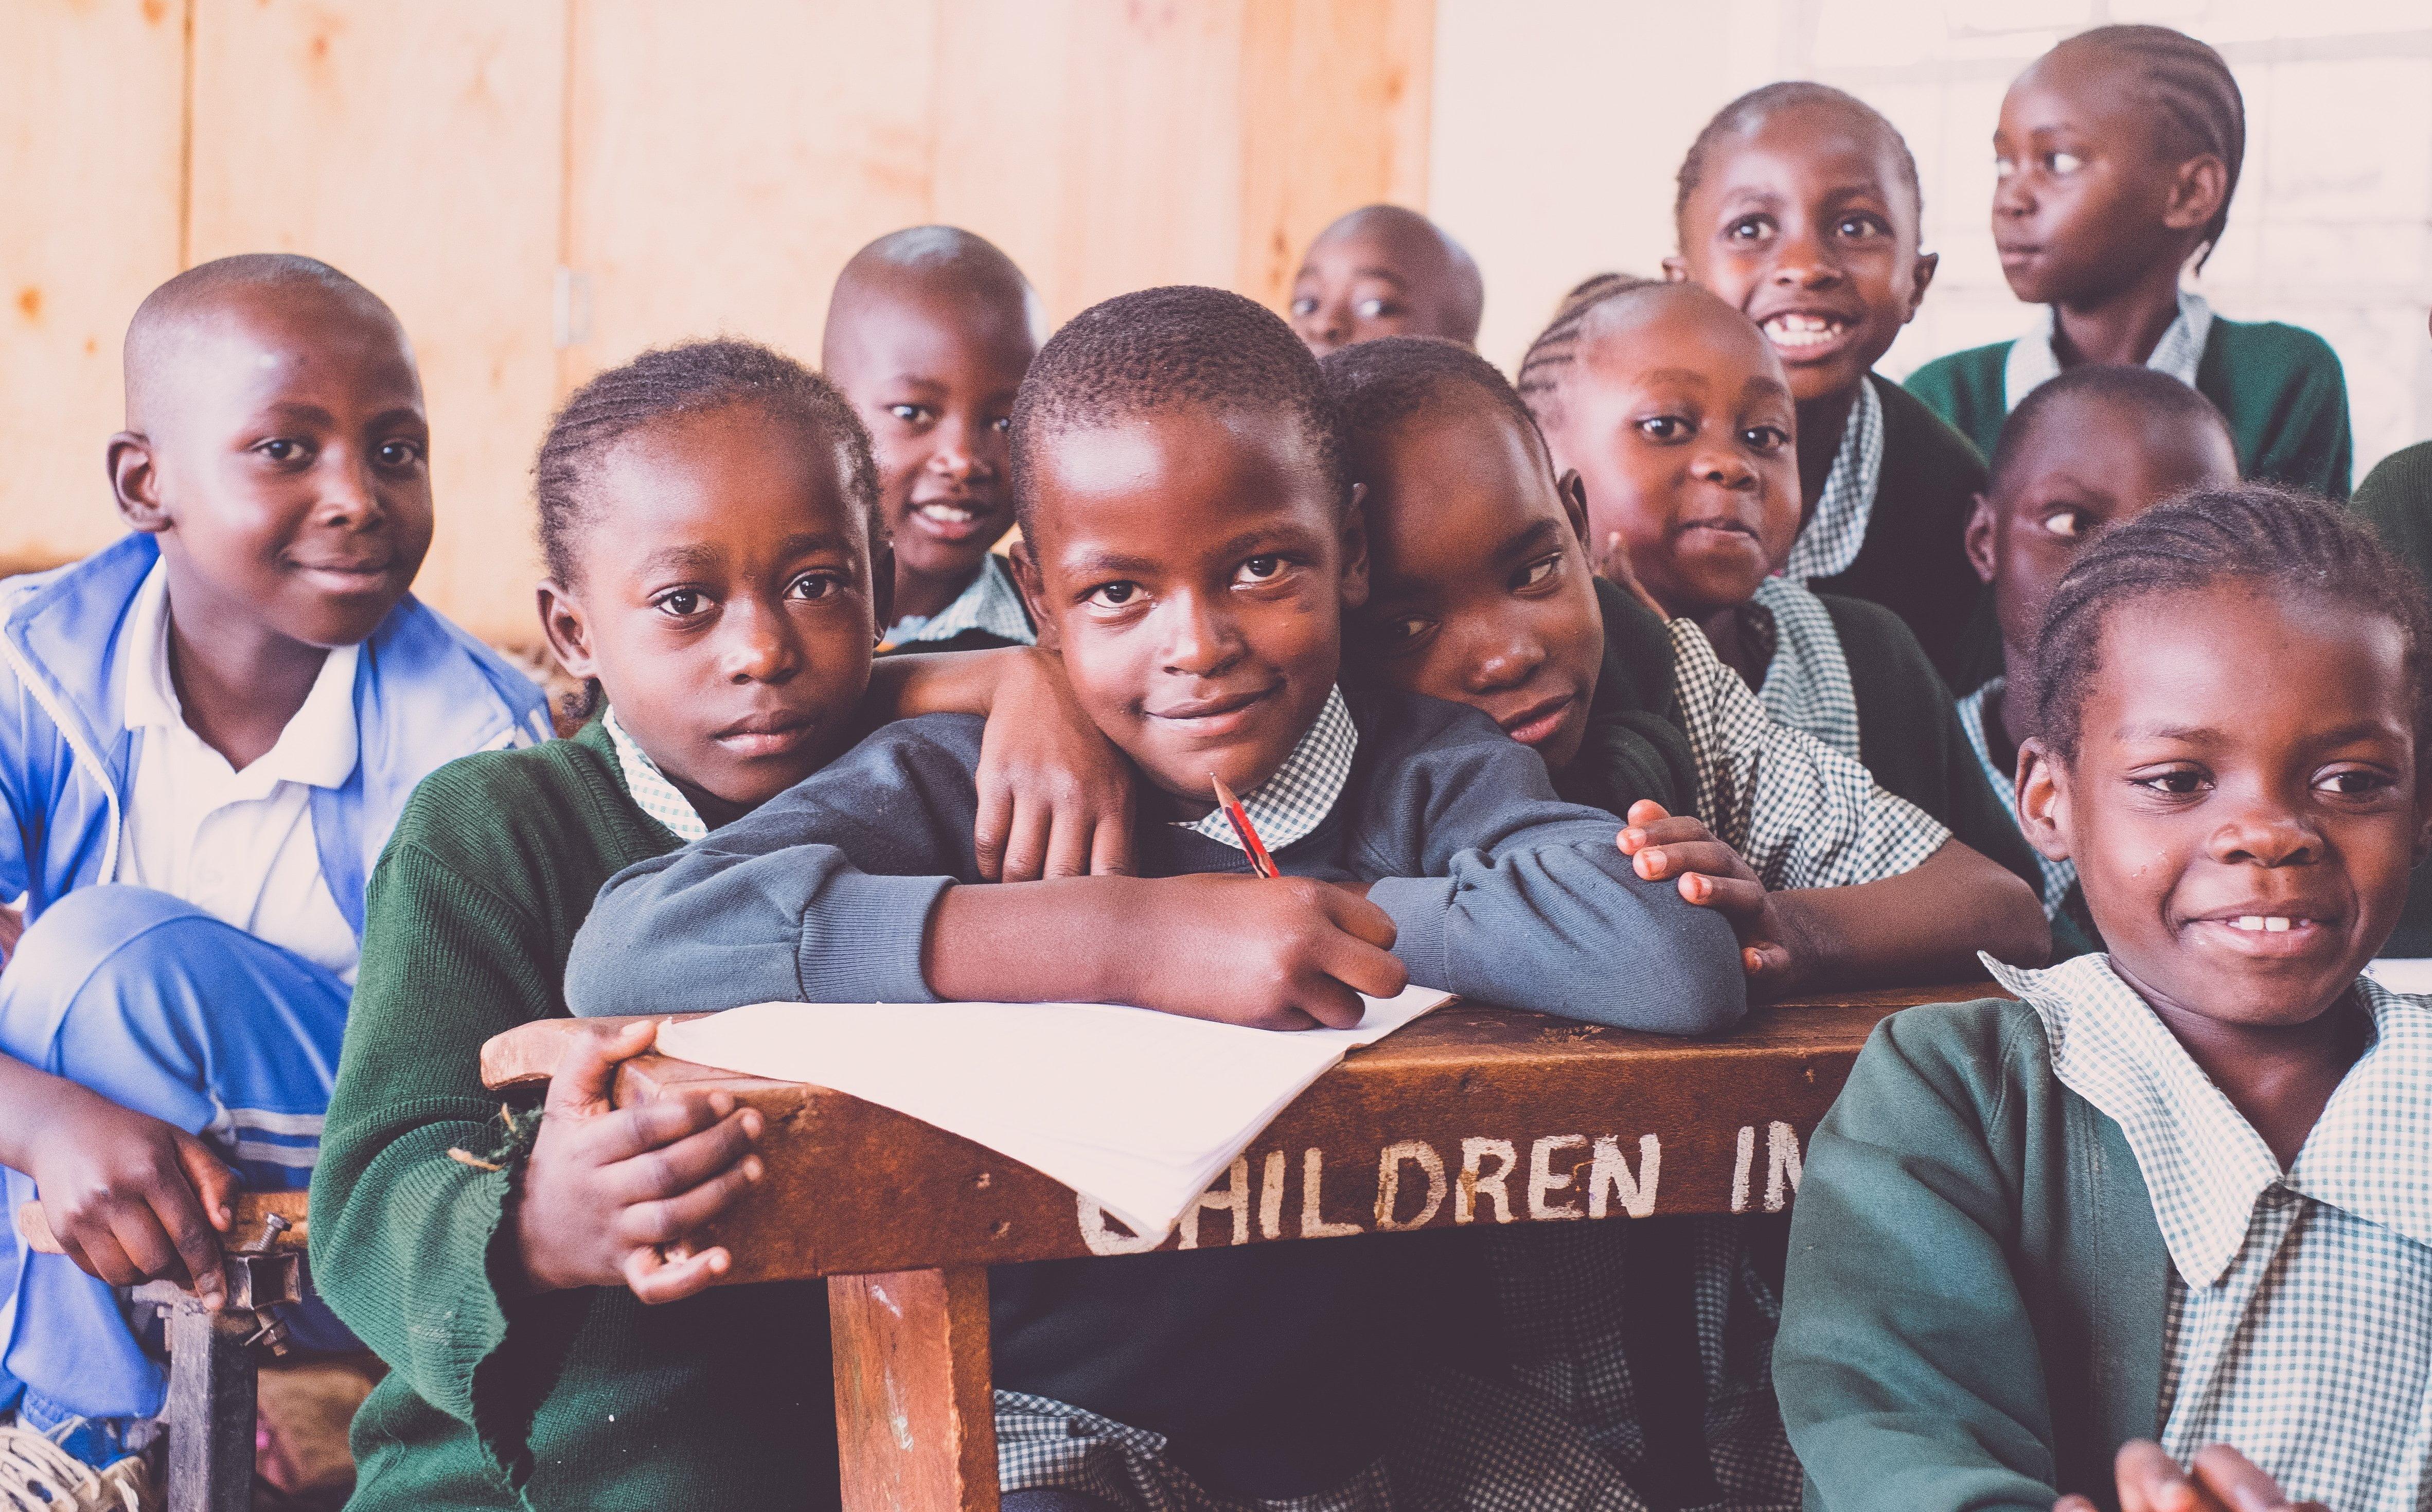 Kenyan children learning at school